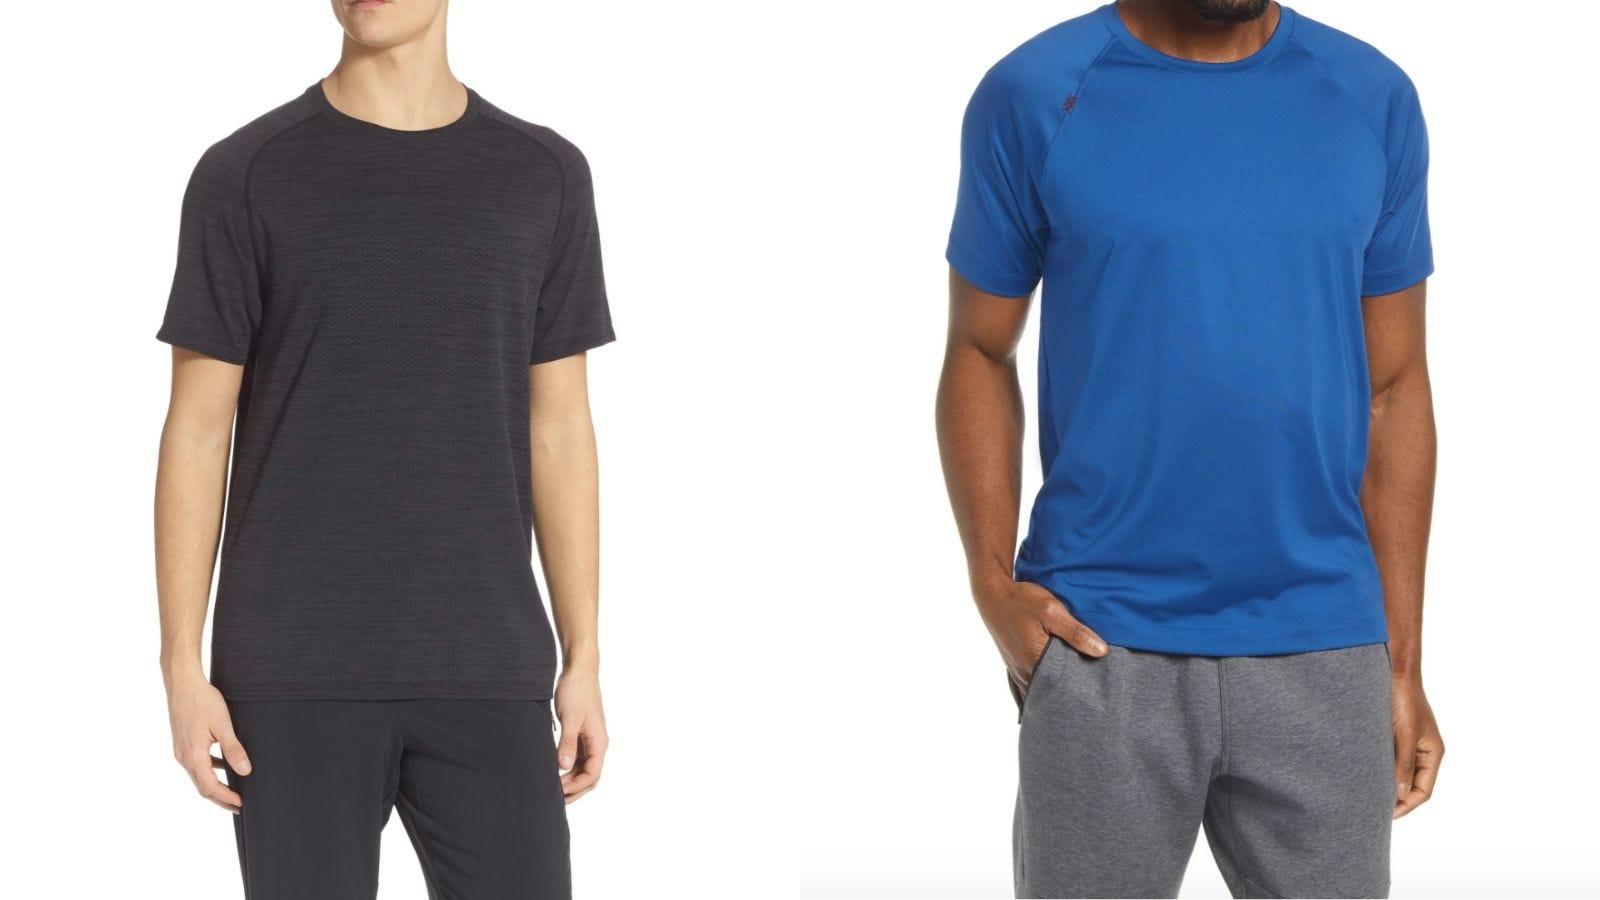 Tate Boys Beach Polo Shirt  comfy summer Brand New $20 kids  Nordstrom Tucker